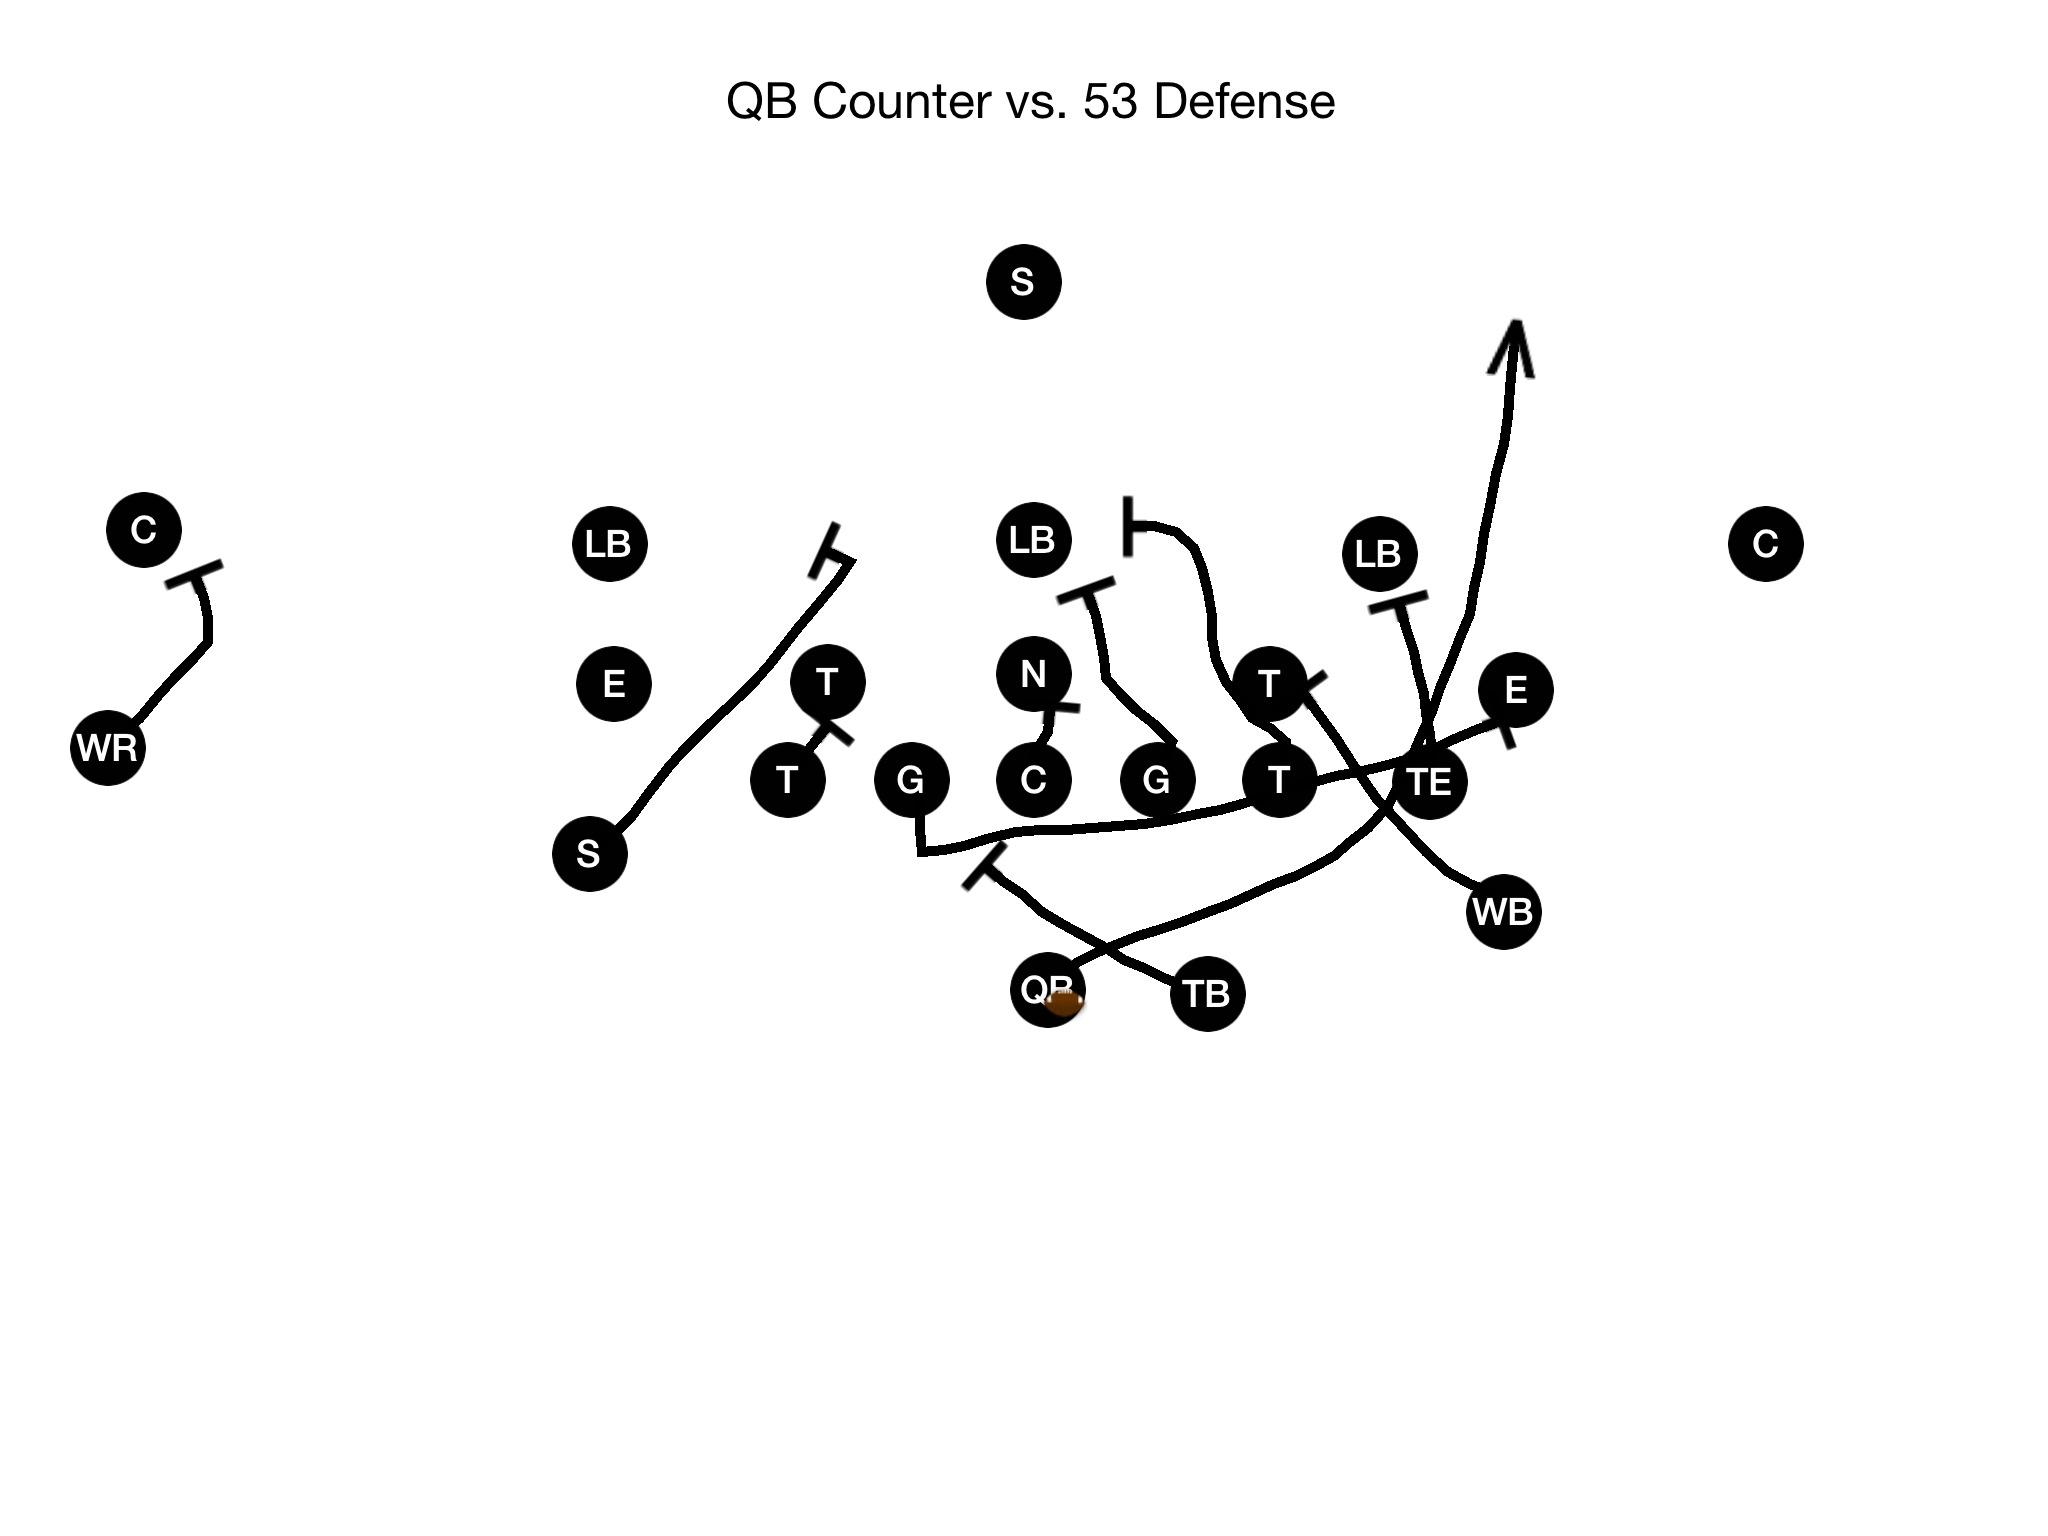 Quarterback Running Plays-QB Counter